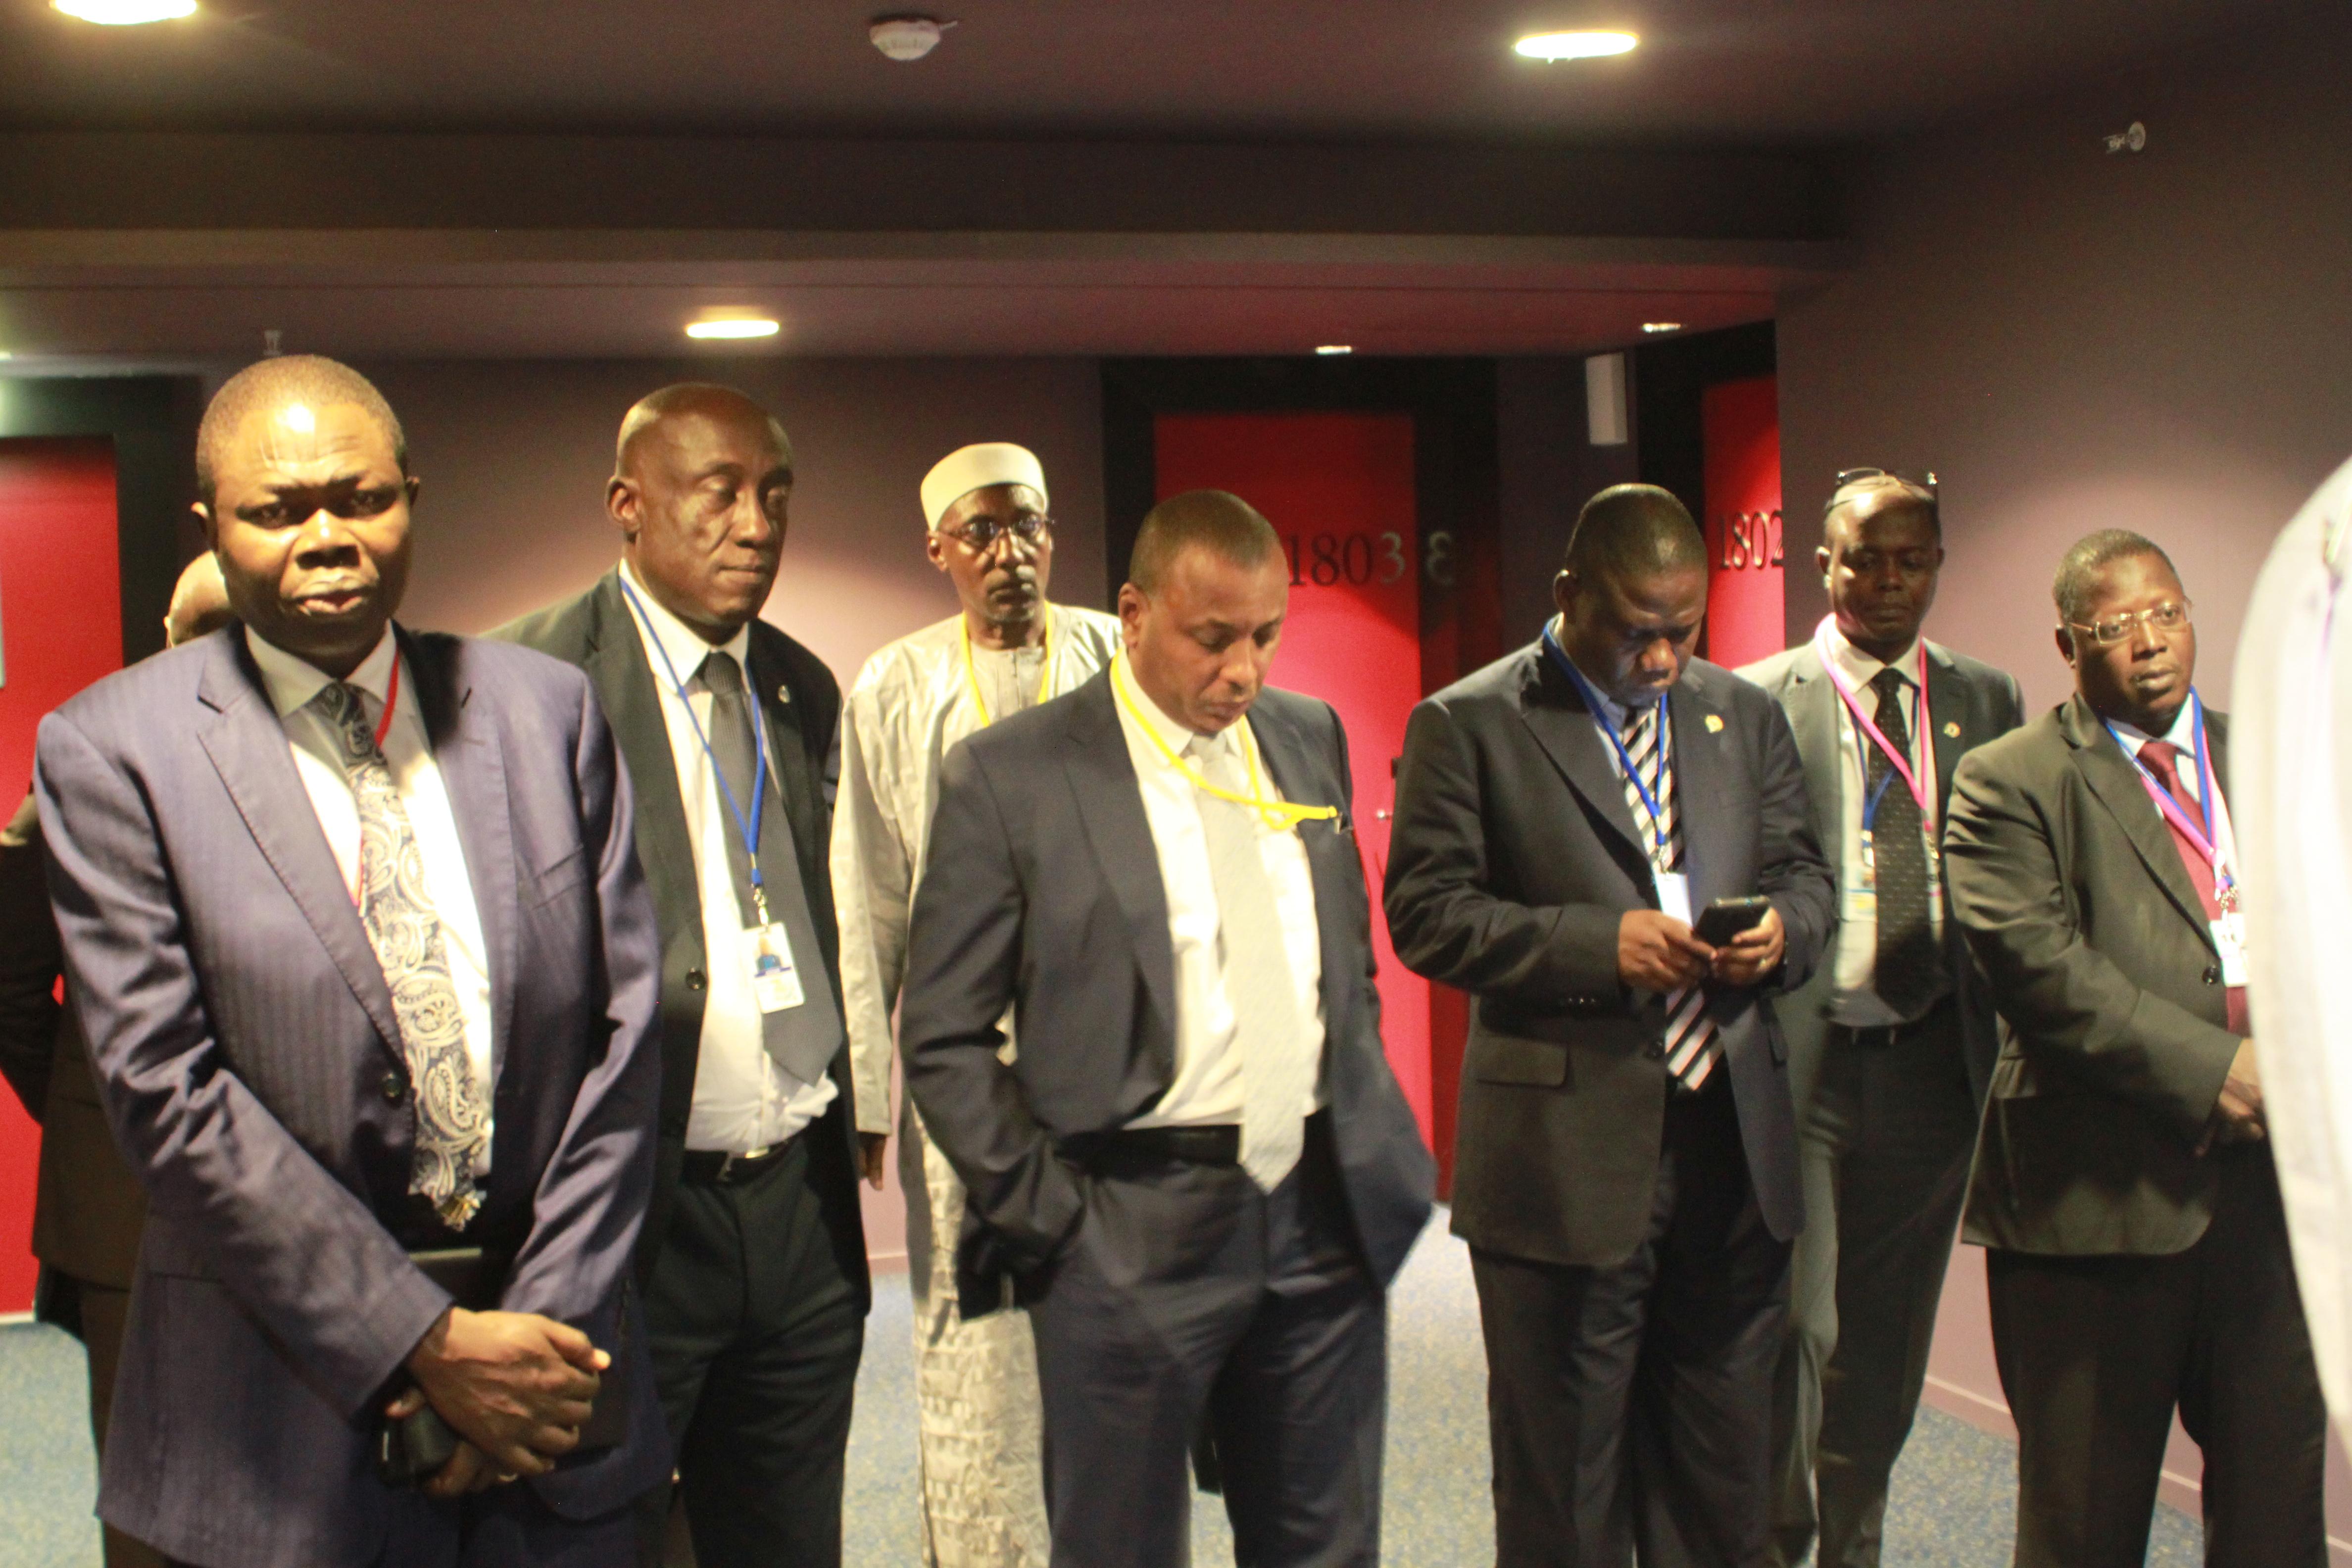 Les officiels et diplomates tchadiens à Abidjan. Alwihda Info